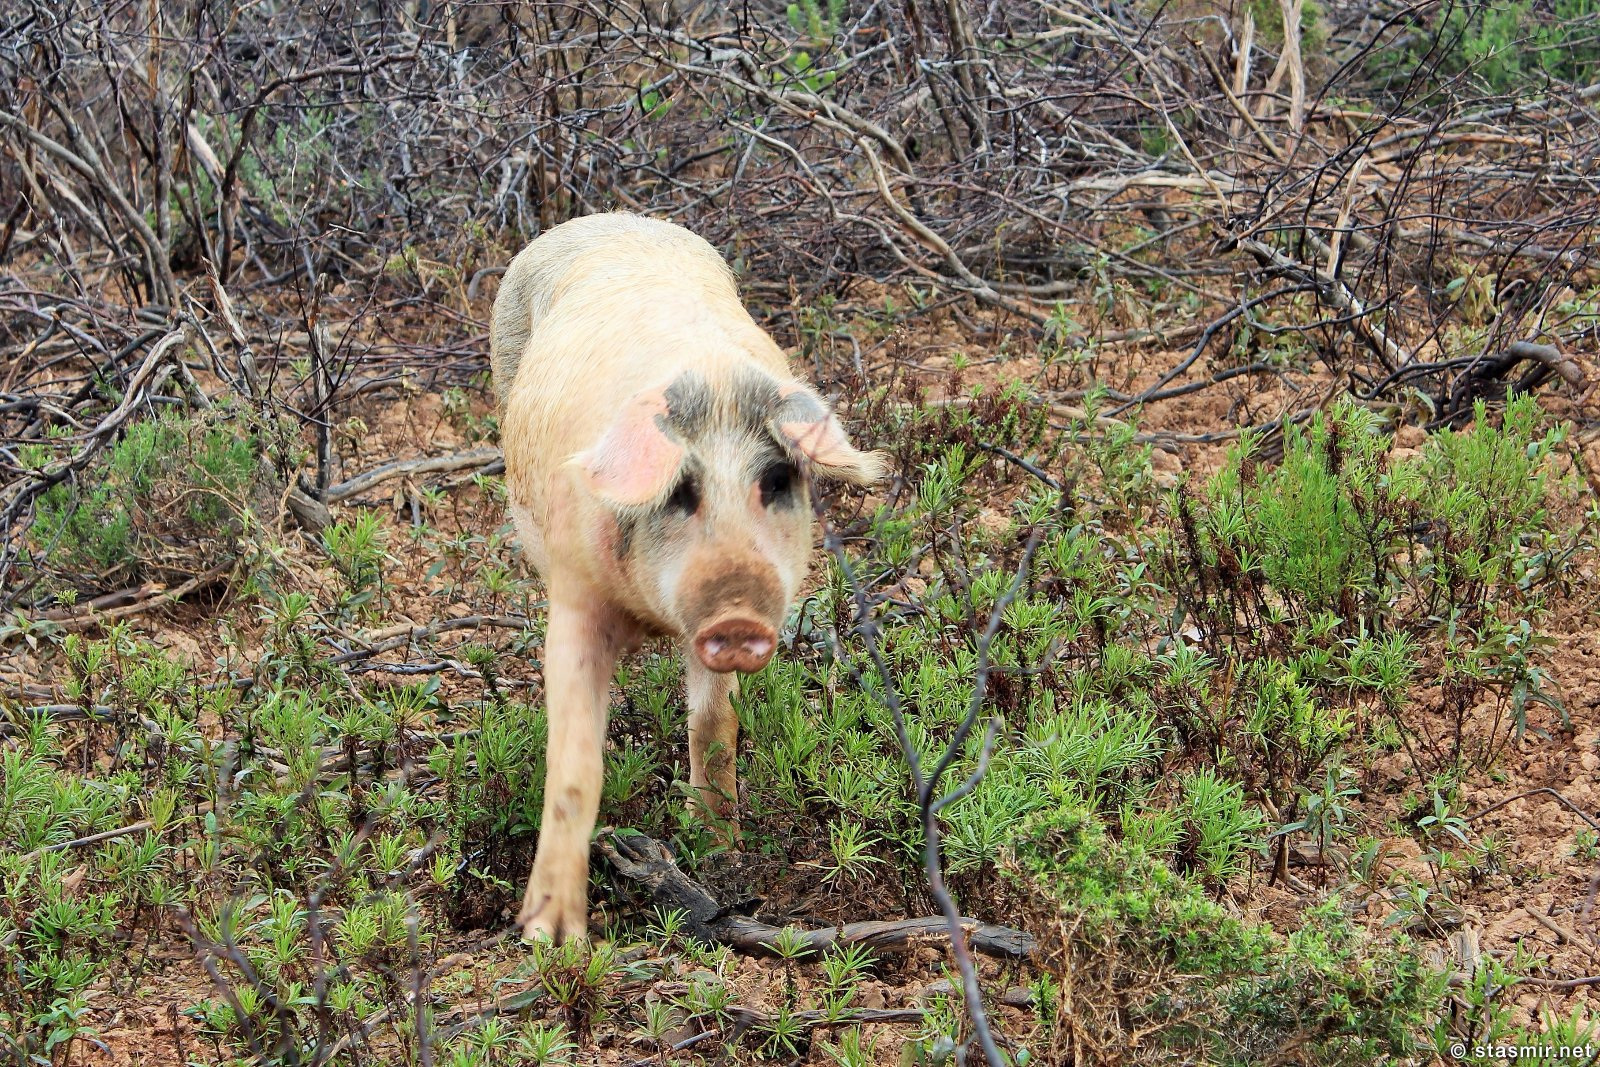 Свинья в провинции Алентежу, Португалия, фото Стасмир, photo Stasmir